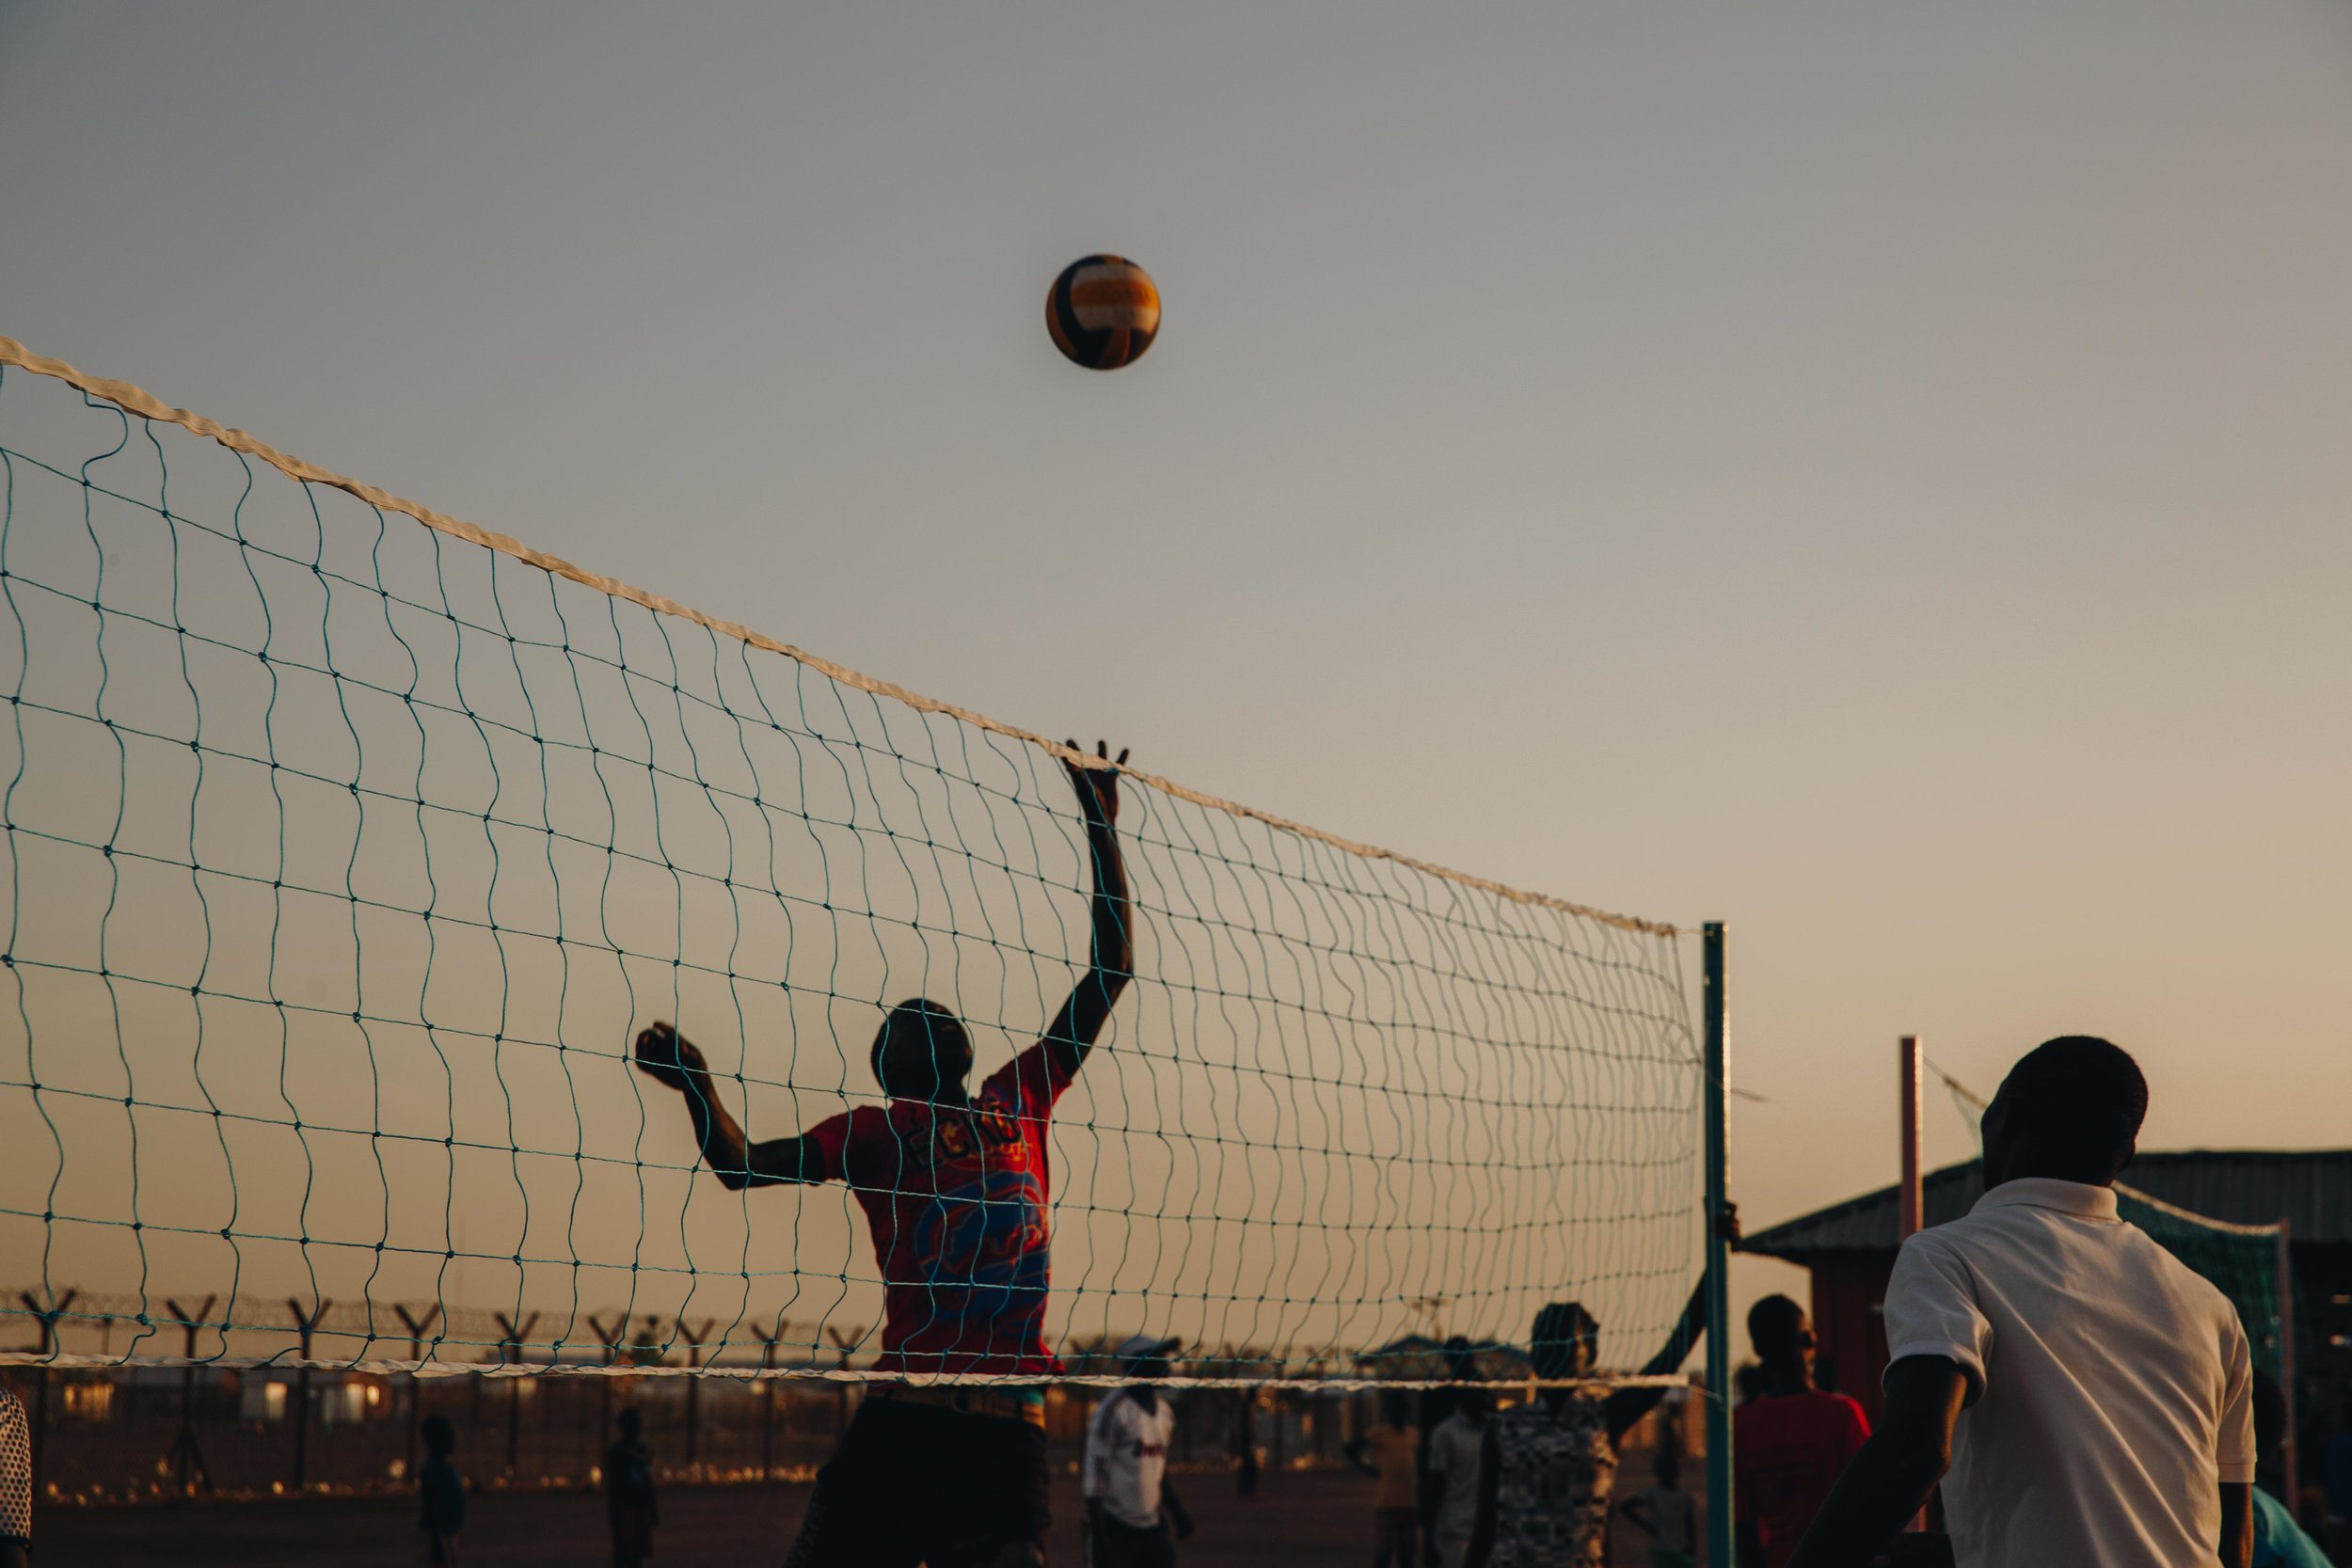 11_KLABU Campaign image _ by Coco Olakunle.jpg